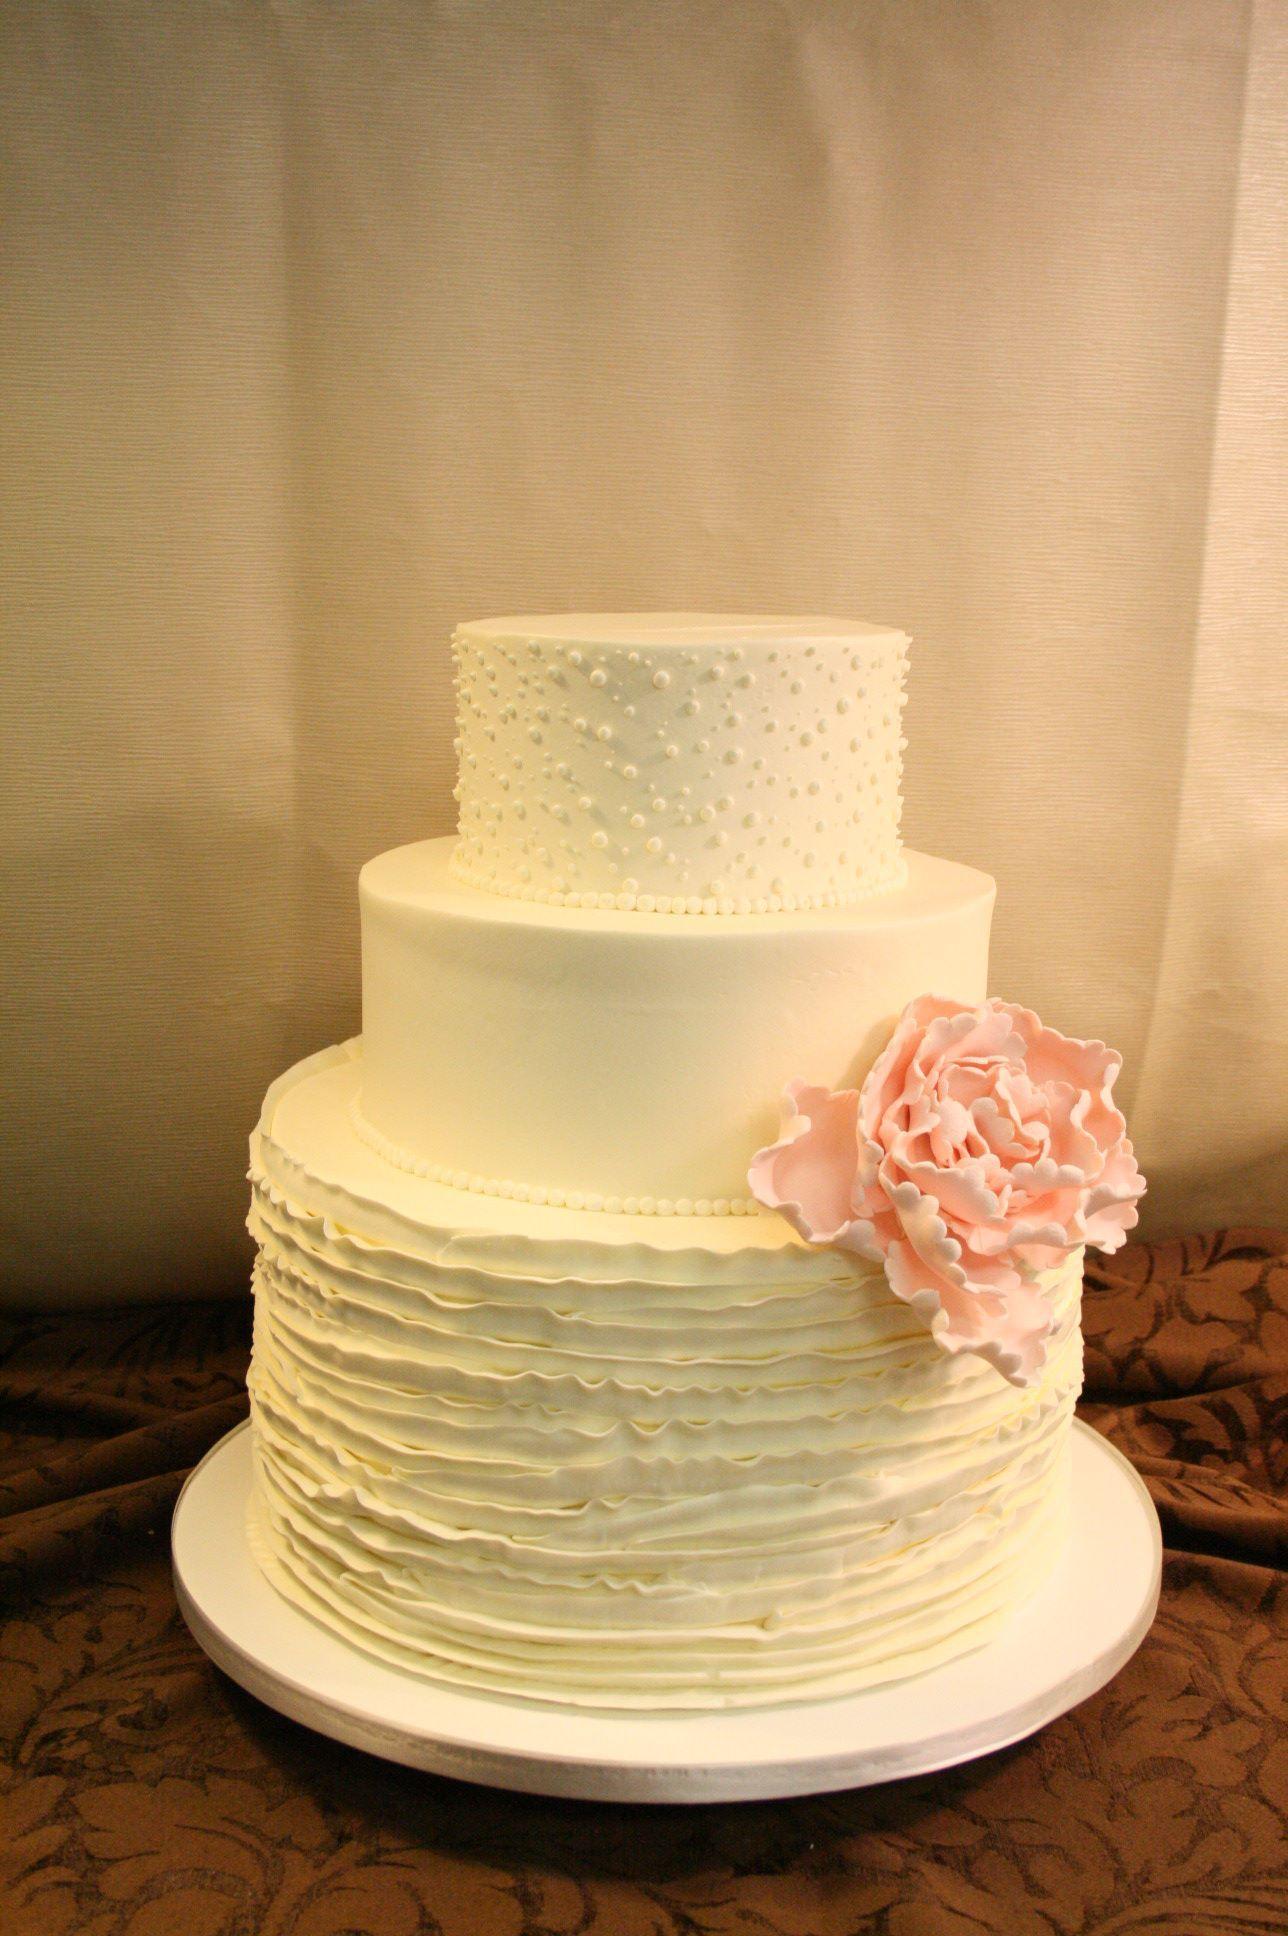 Dessert works bakery westwood ma cake gallery wedding